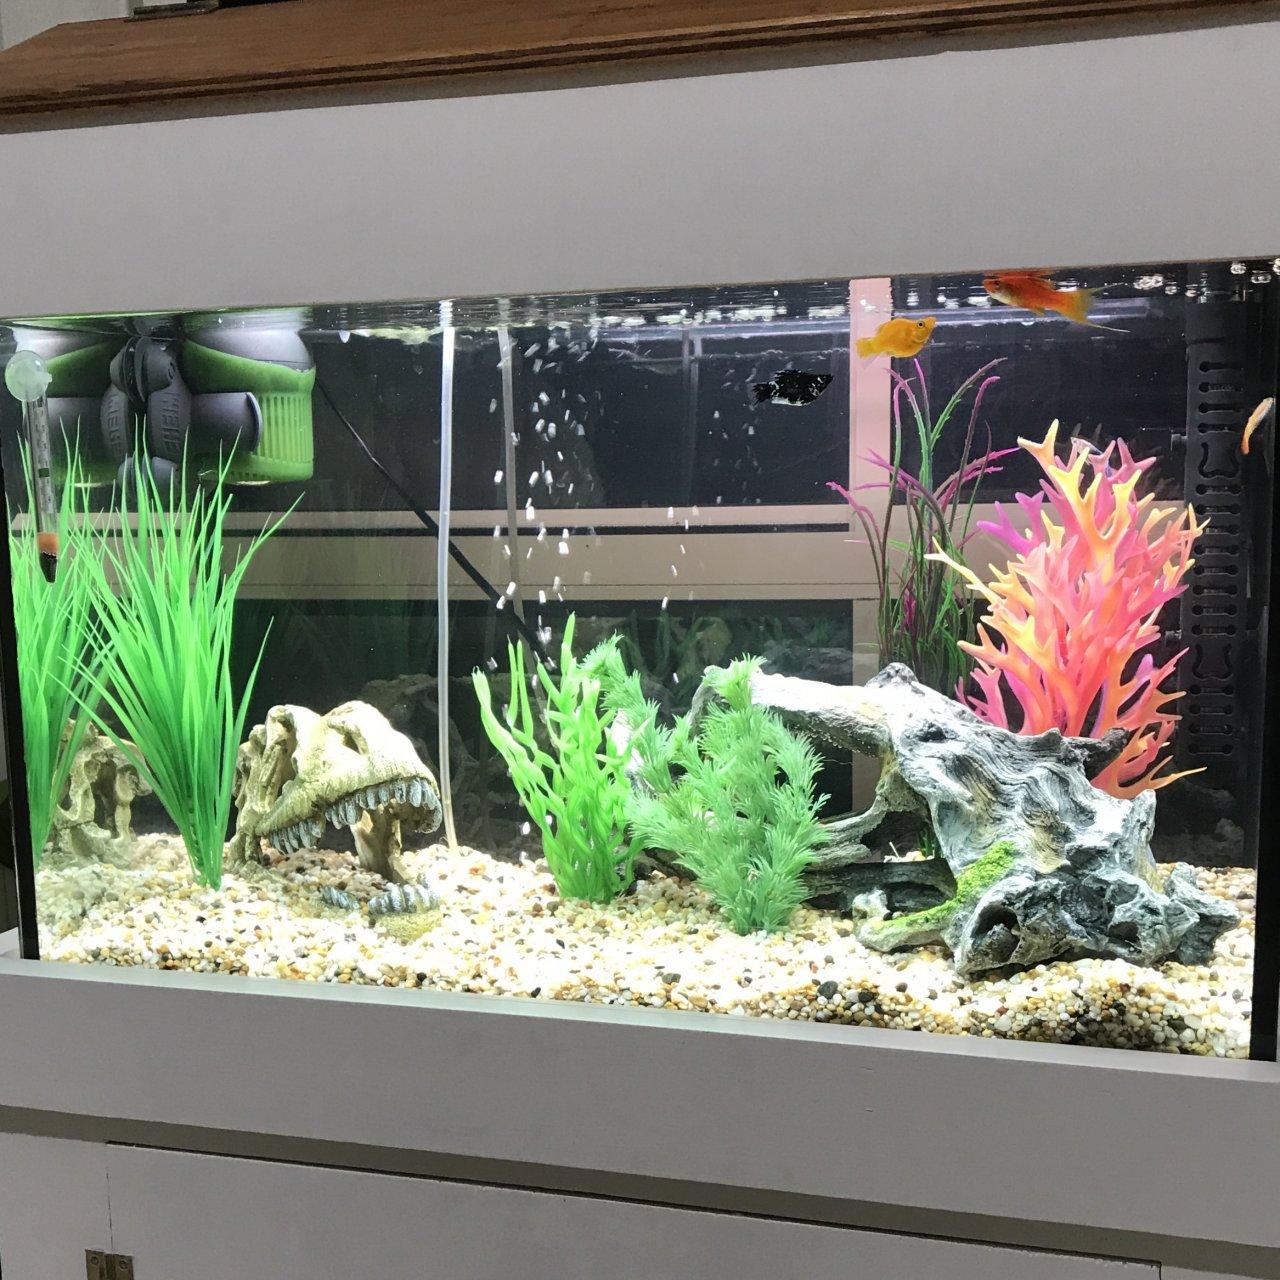 Fish in tank with high ammonia levels my aquarium club for Ammonia in fish tank